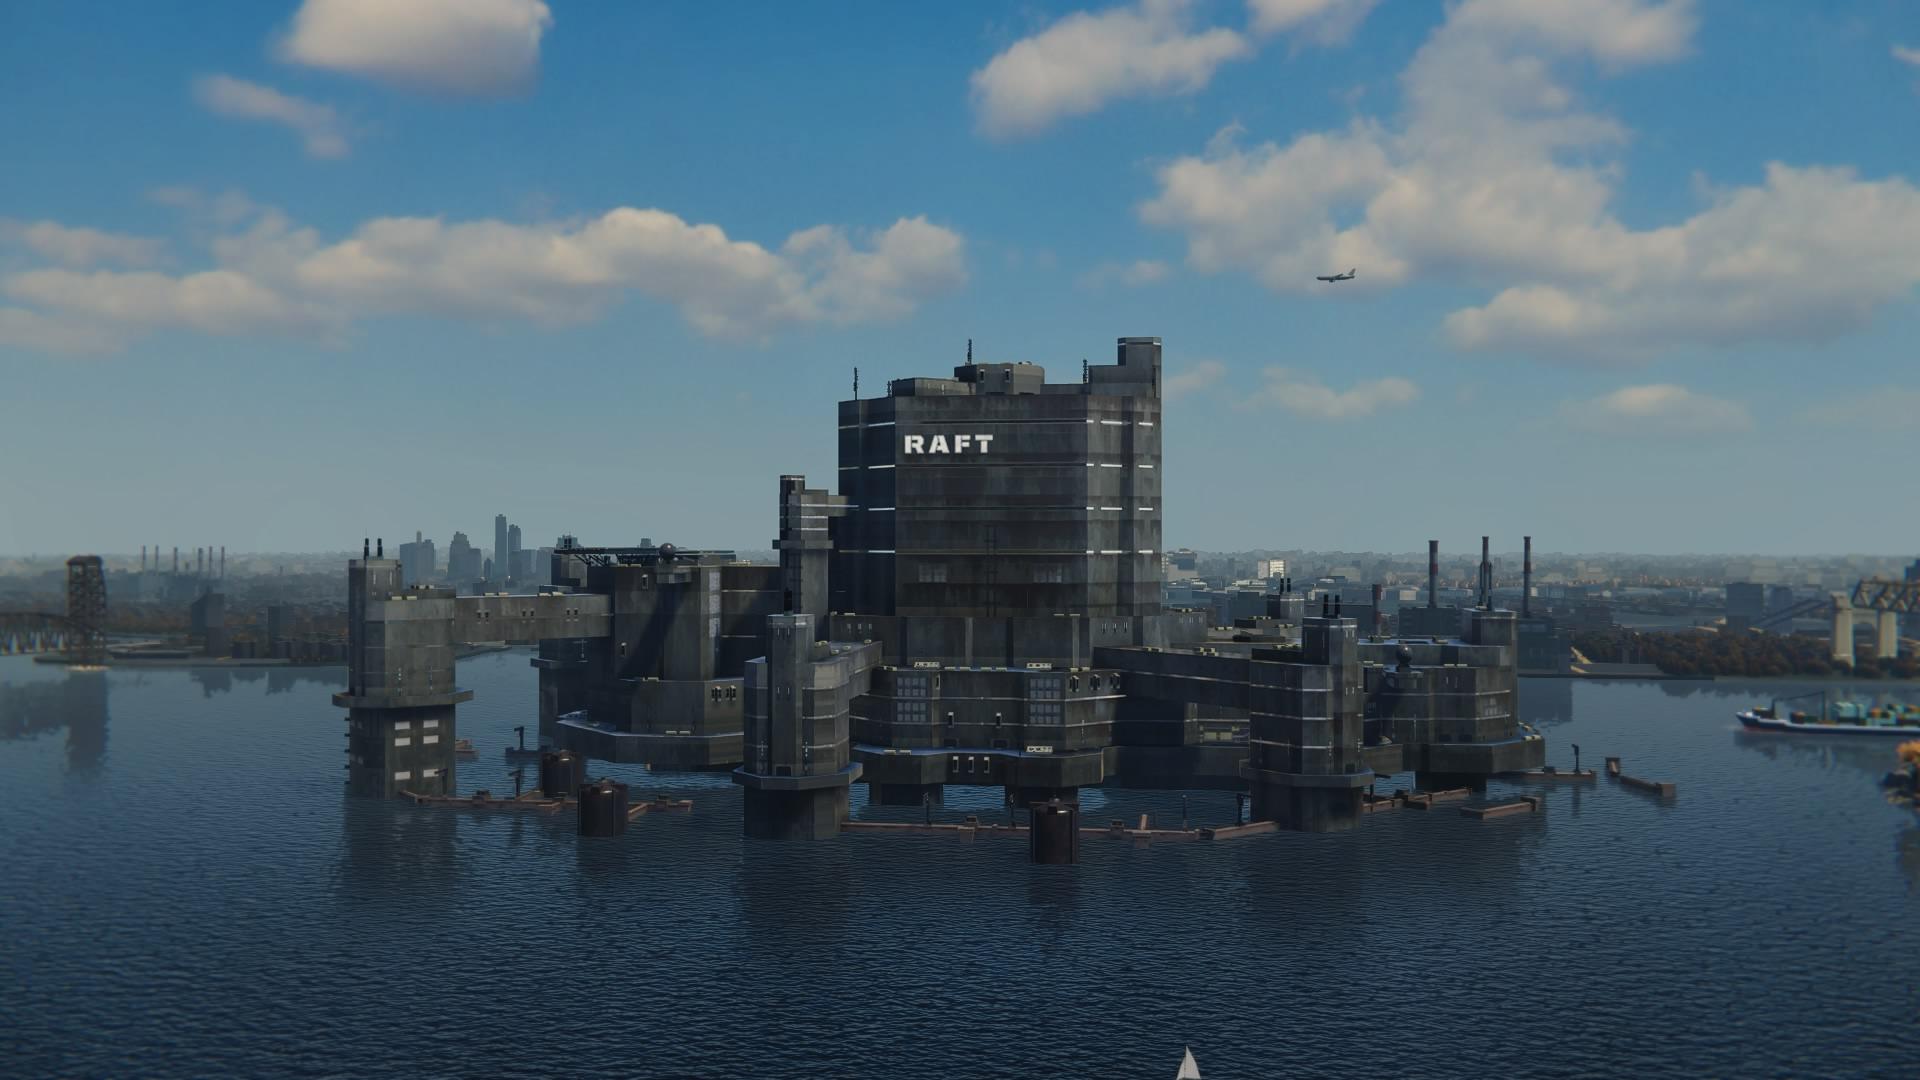 Raft on Marvel's Spider-Man (video game) 0001.jpg